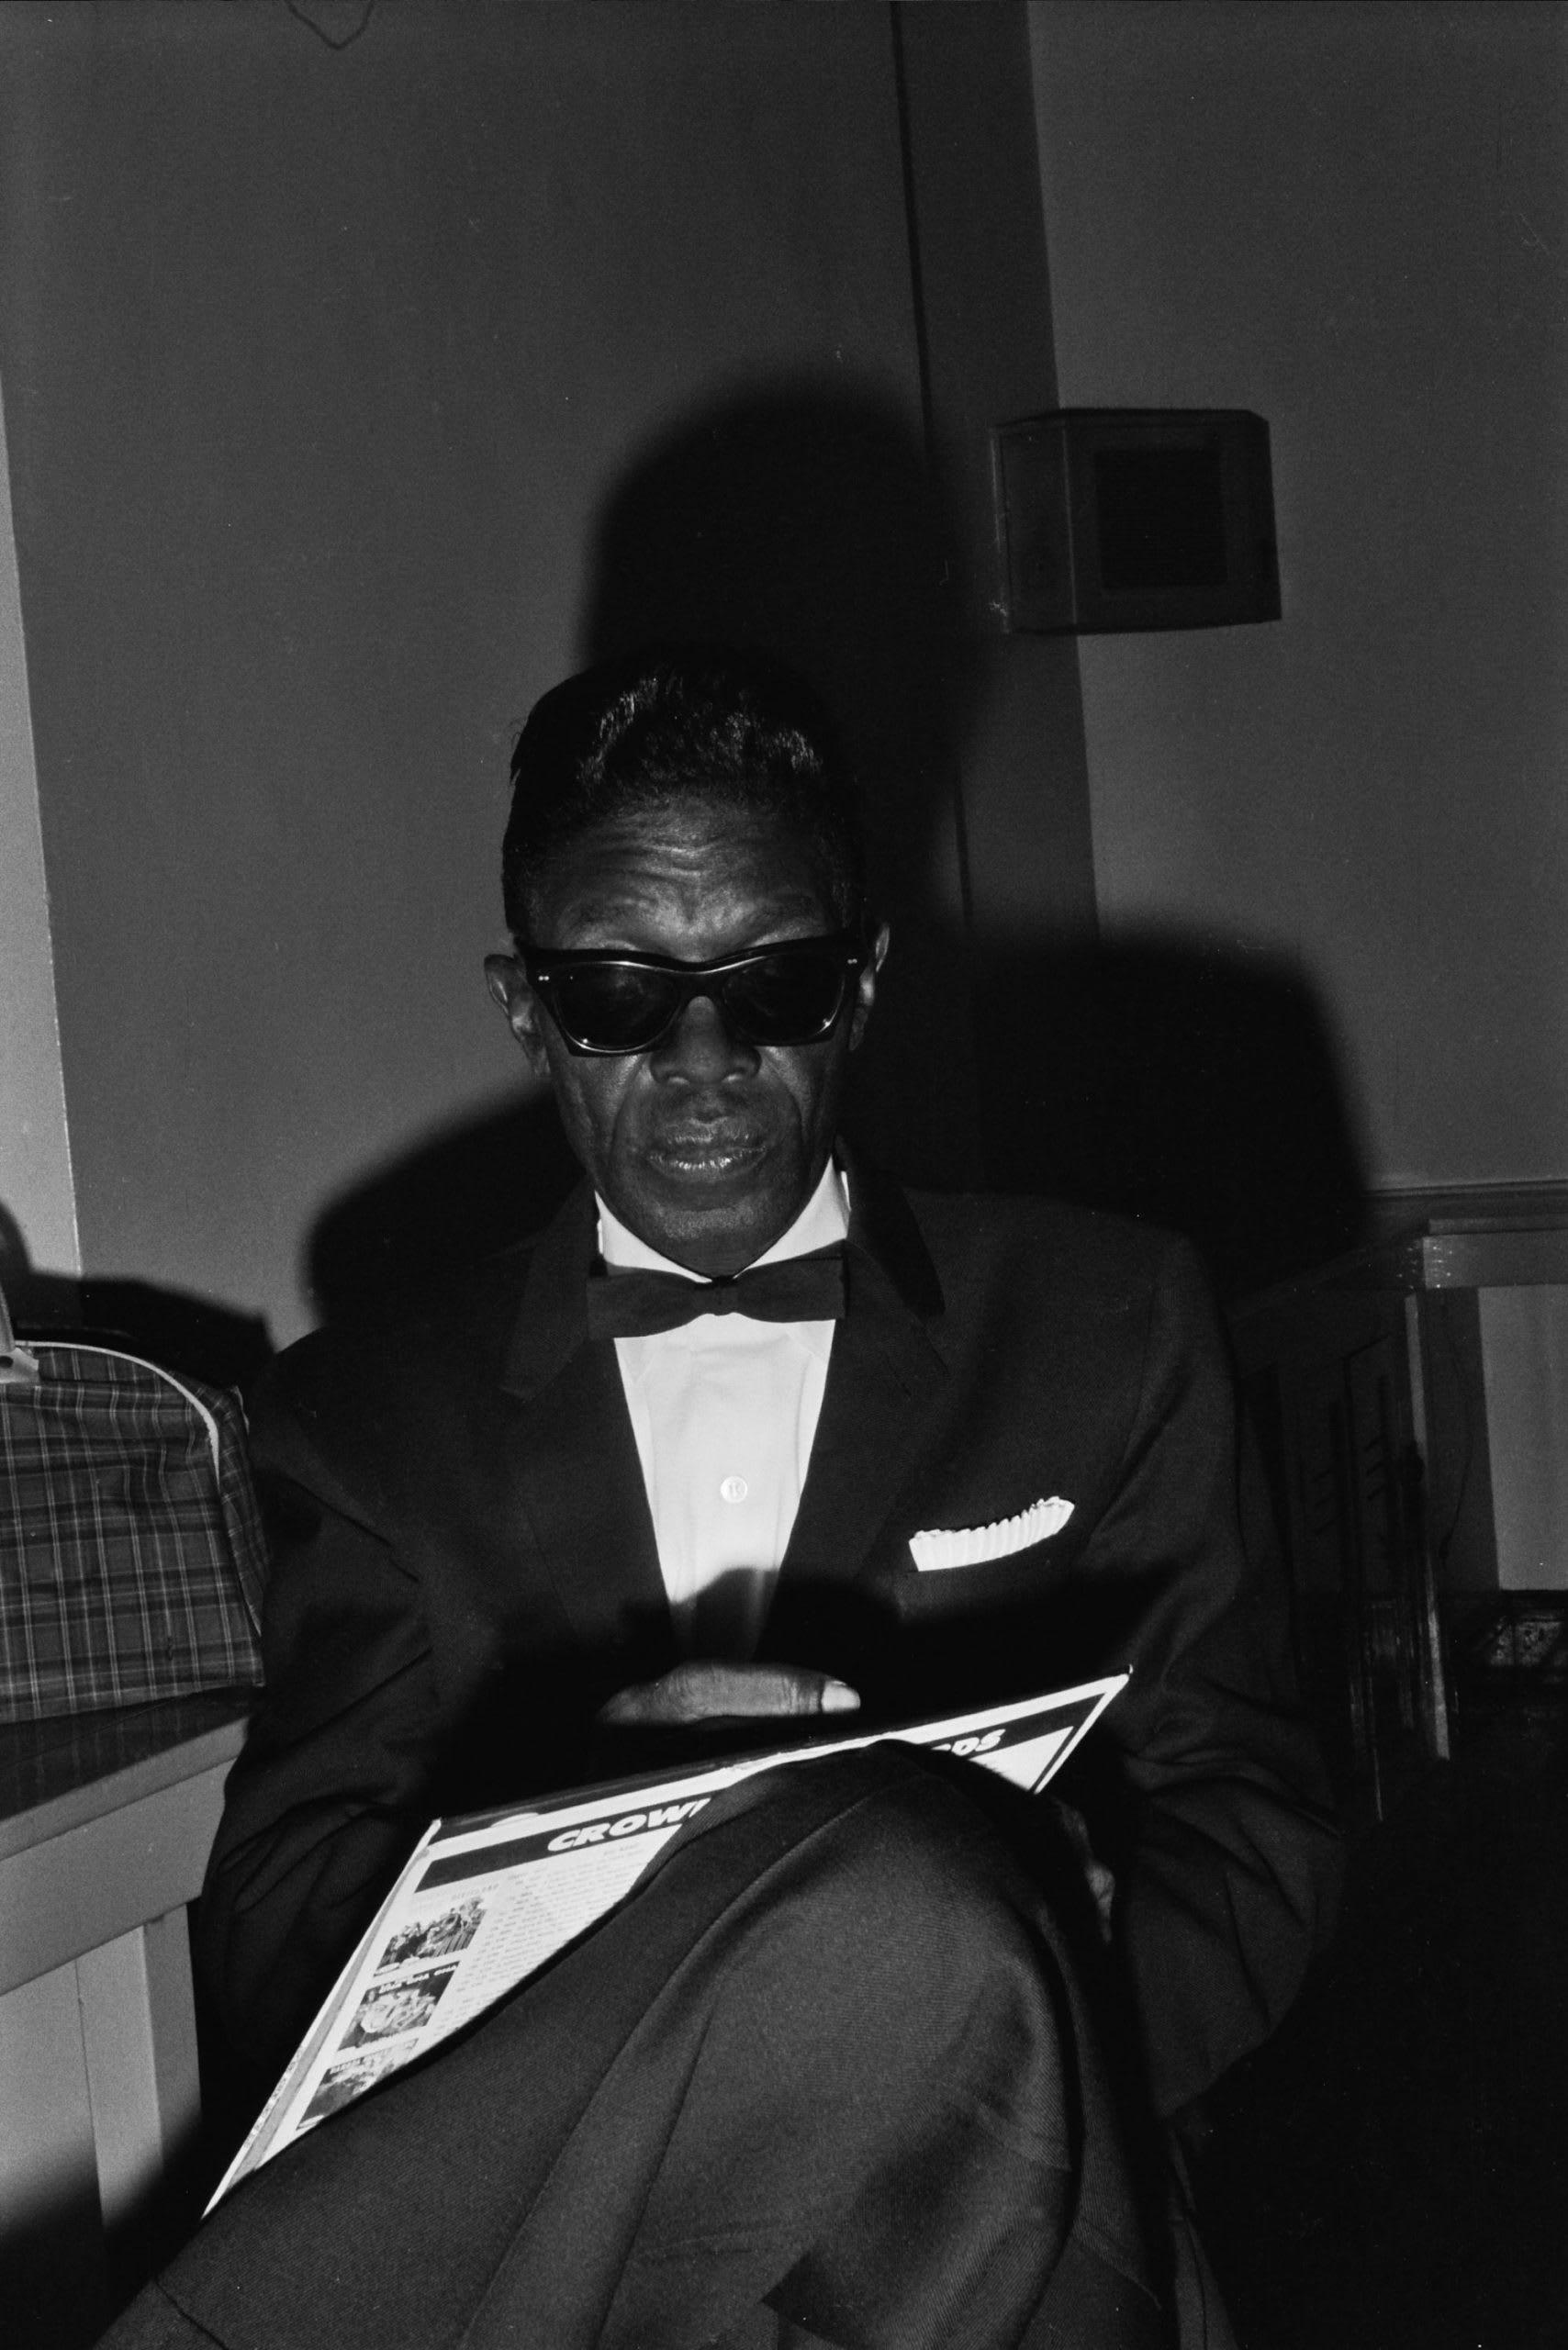 Portrait of Lightnin' Hopkins. A Texas Blues musician